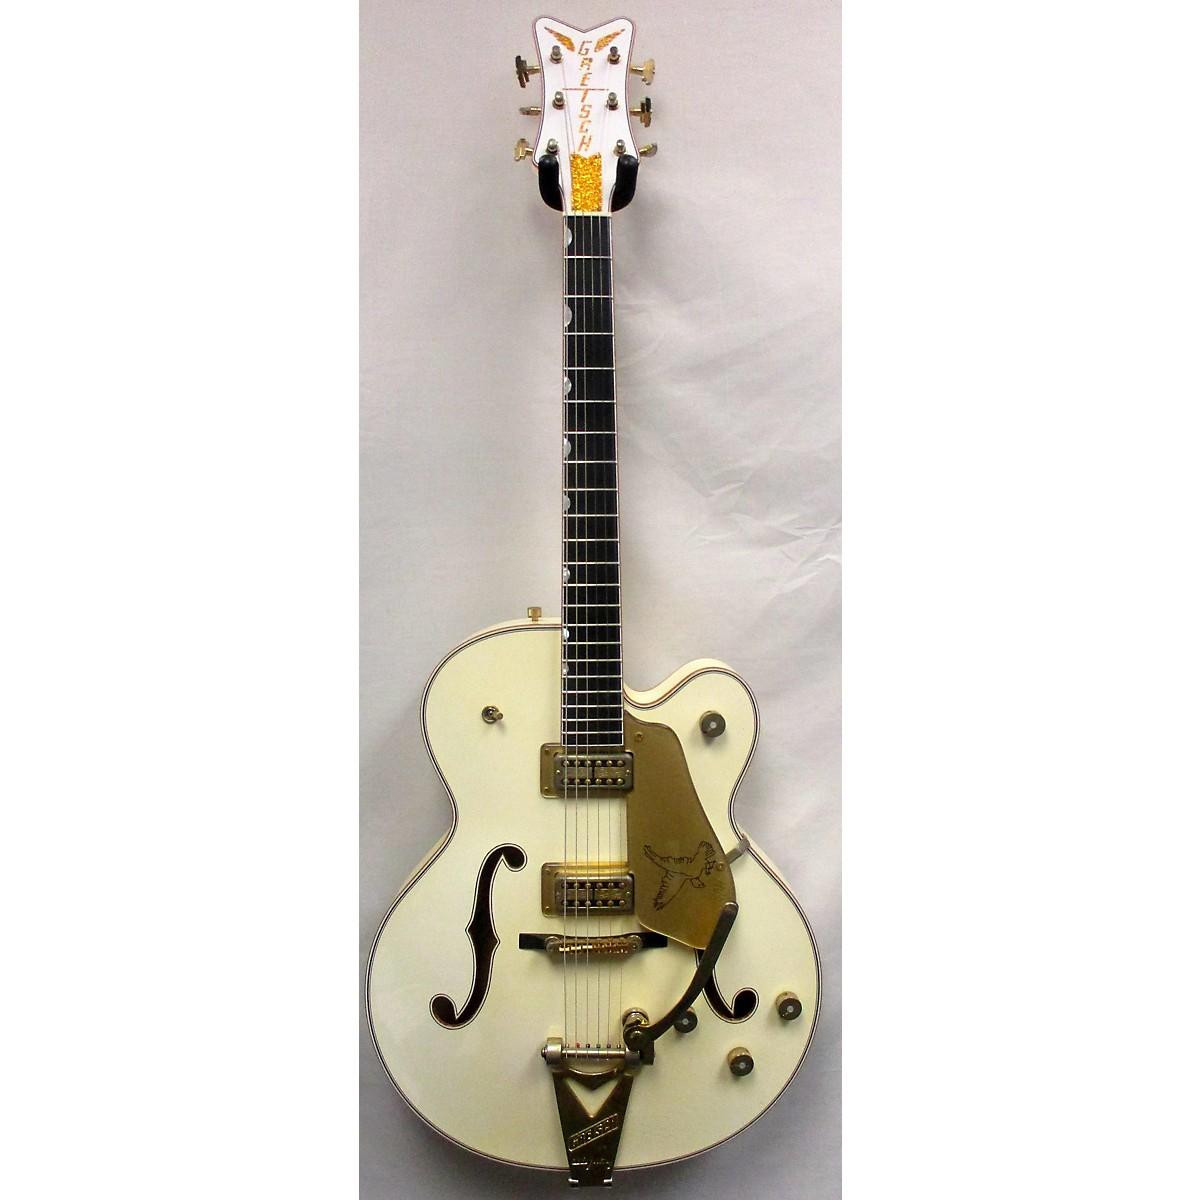 Gretsch Guitars 2017 USA Custom Shop White Falcon G6136-CS Stephen Stern Masterbuilt Closet Classic Hollow Body Electric Guitar